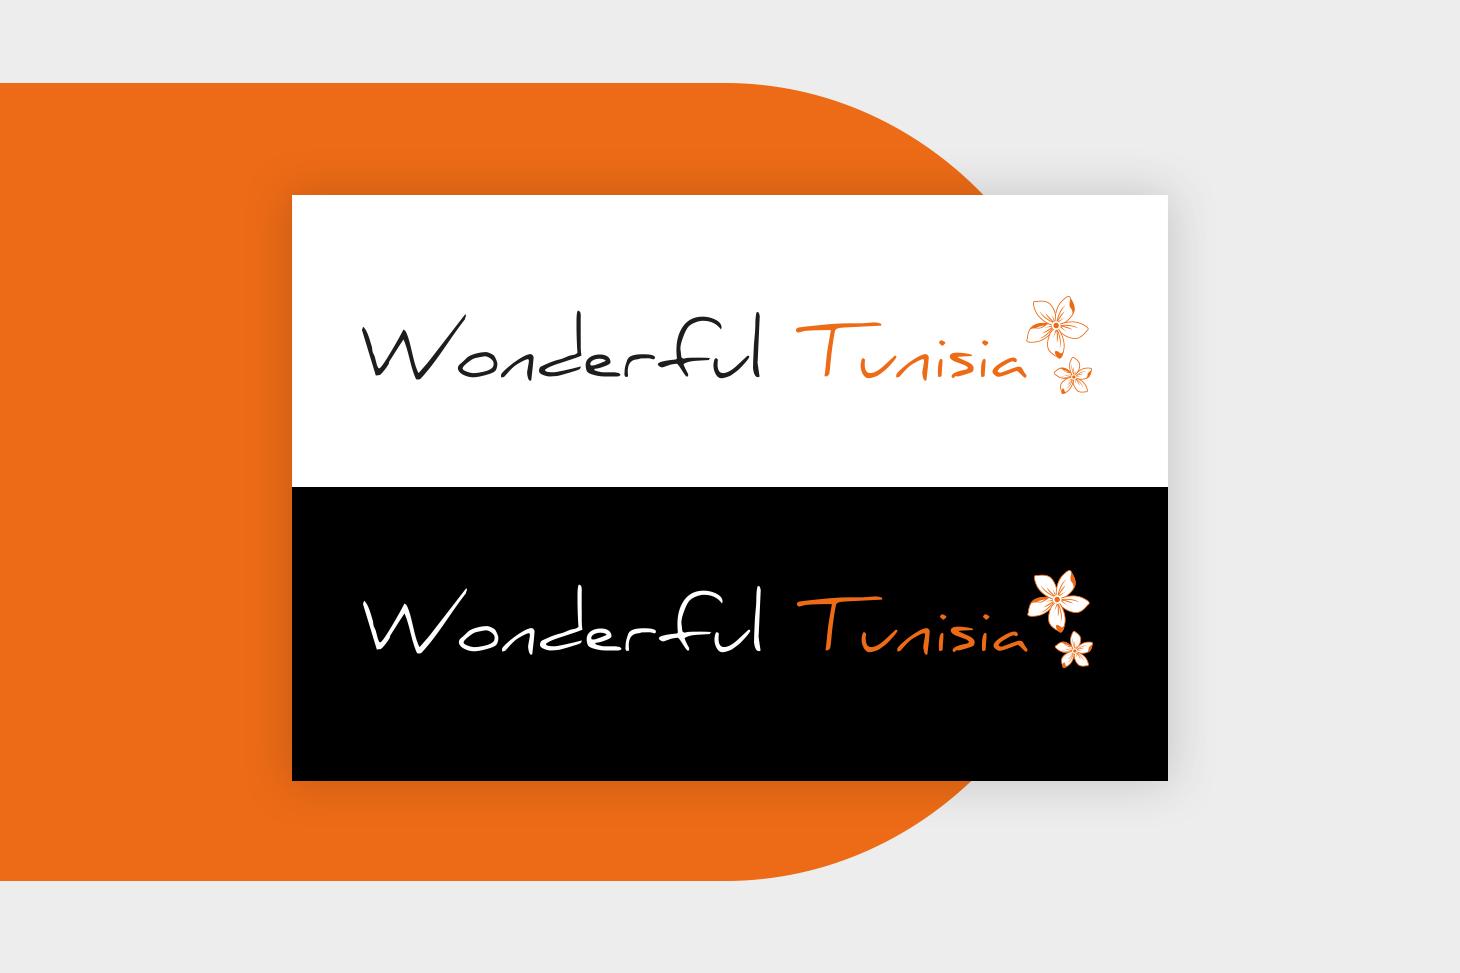 Wonderful Tunisia